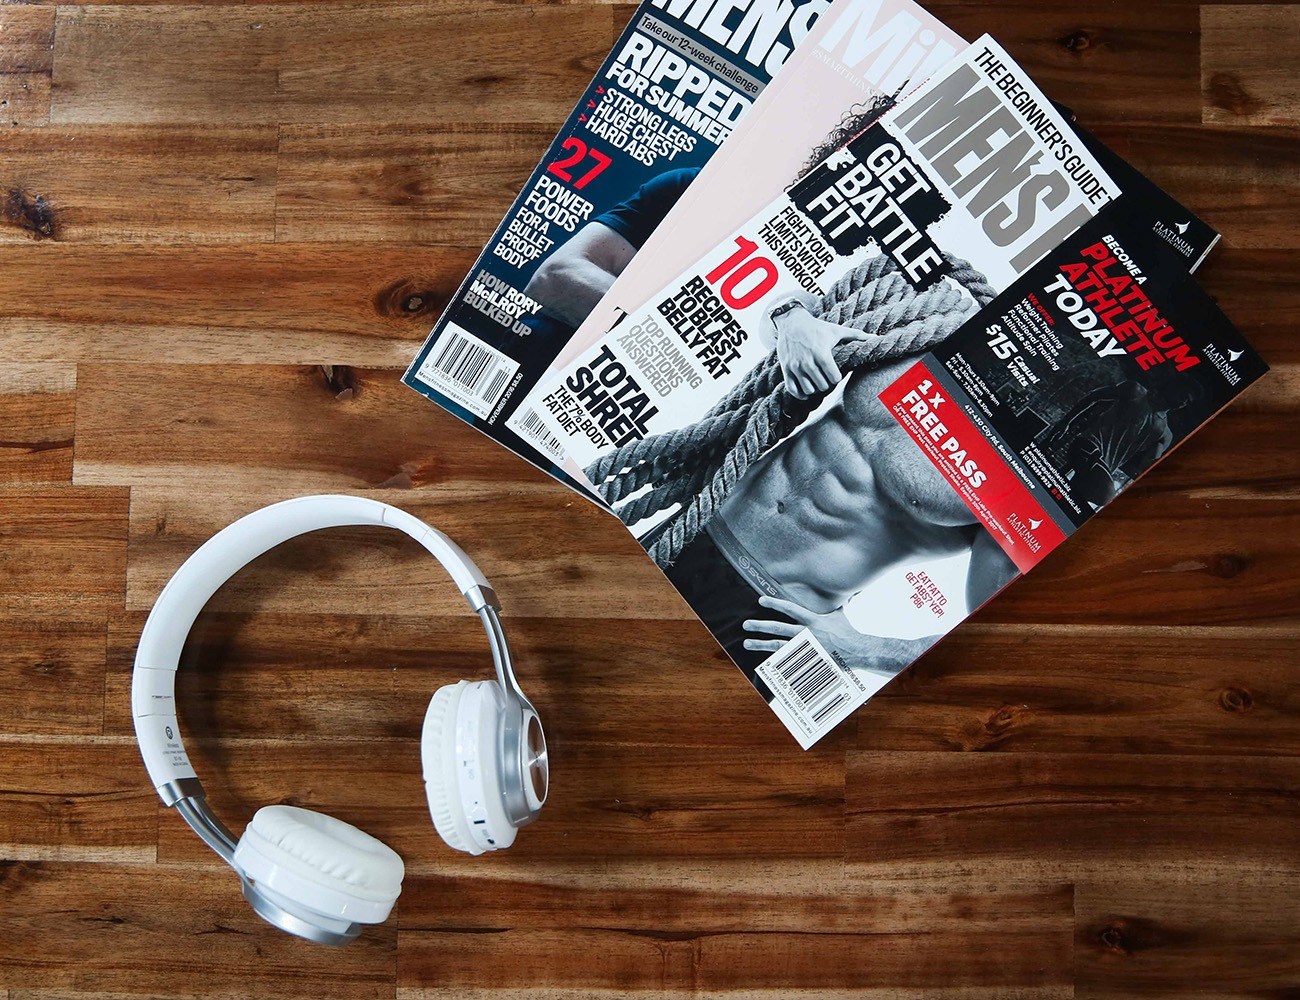 Apollo Audio Wireless Headsets